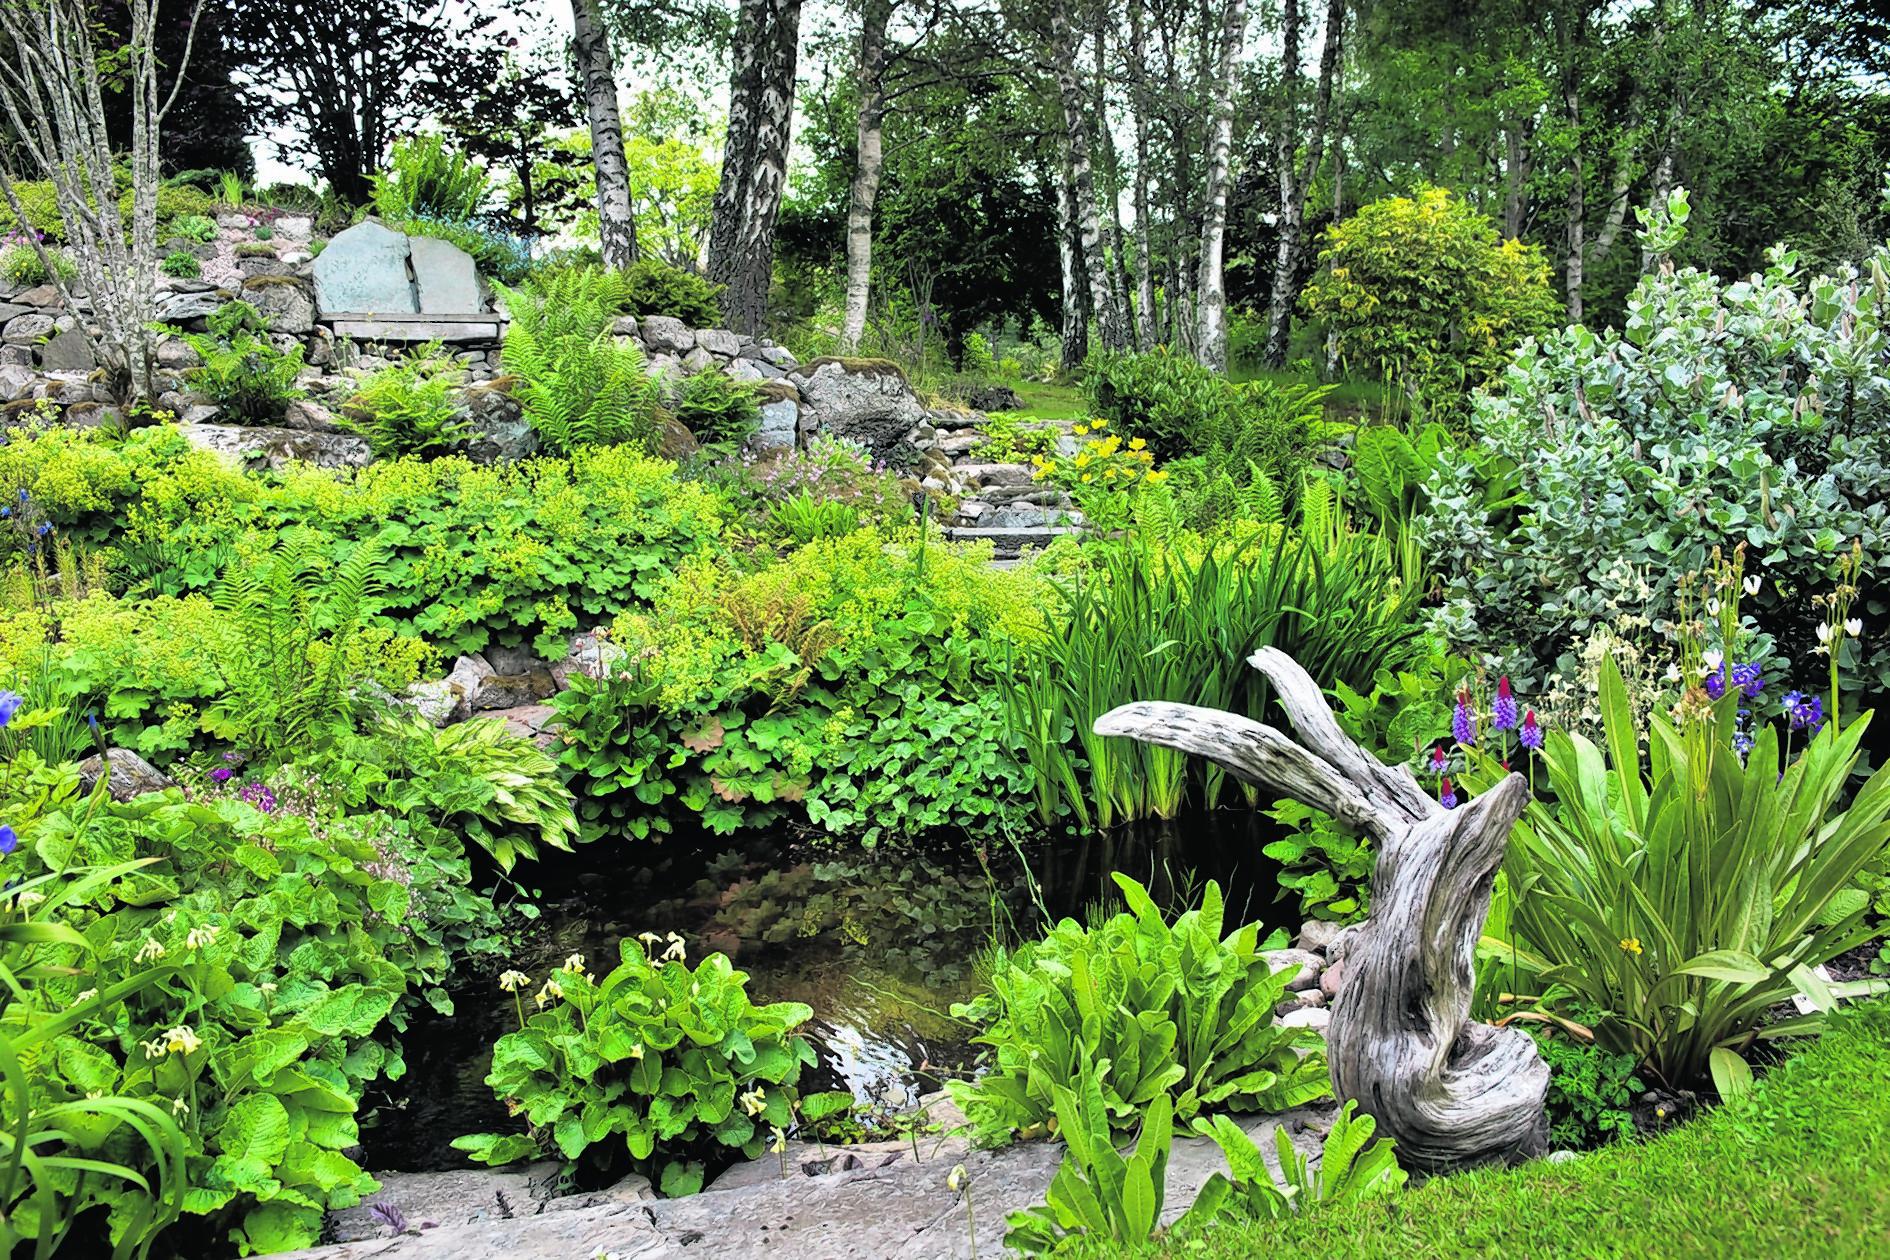 Pond in woodland garden with plants including Alchemilla mollis (lady's mantle), Lysichiton americanus (Skunk cabbage), Salix cv (willow), Primula cv and Iris cv